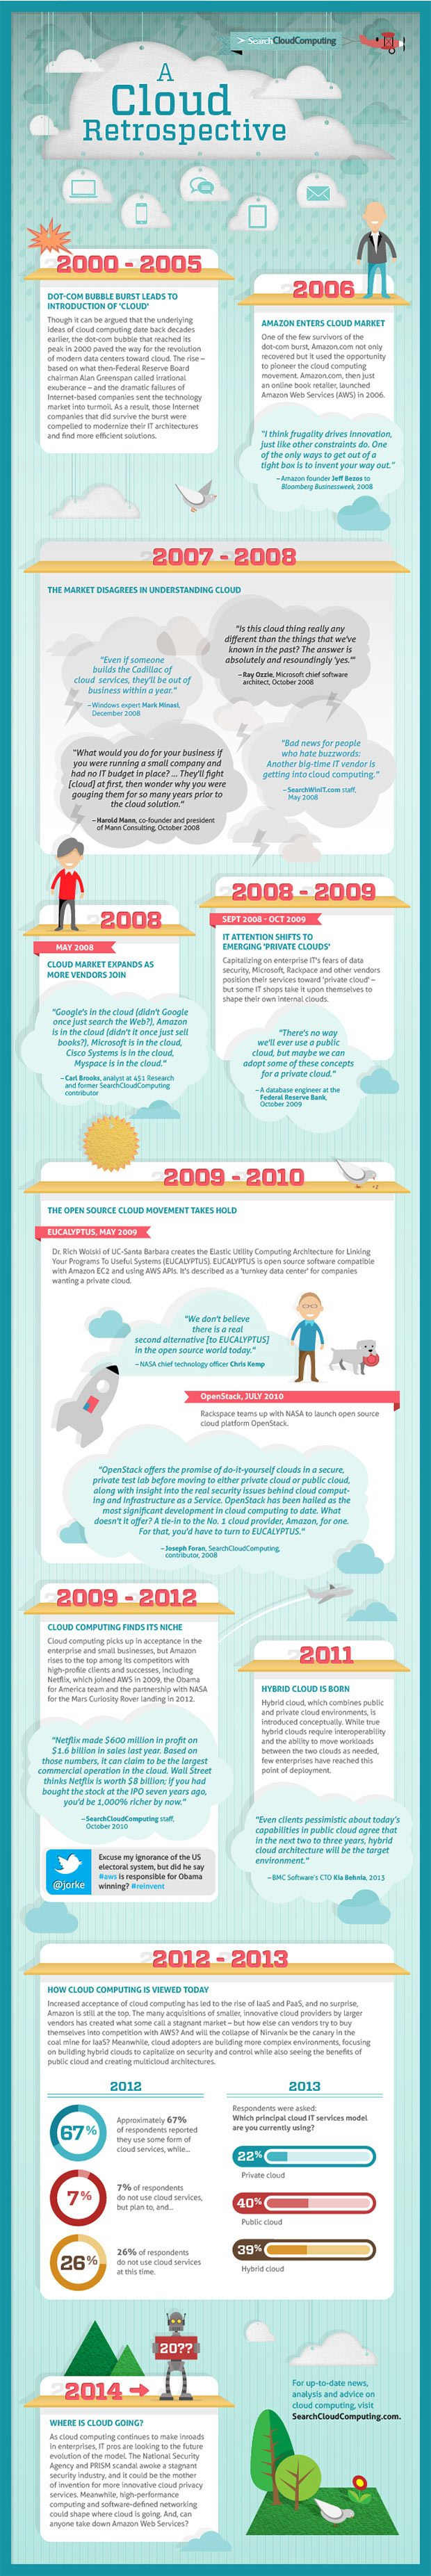 cloud-retrospective-infographic-history